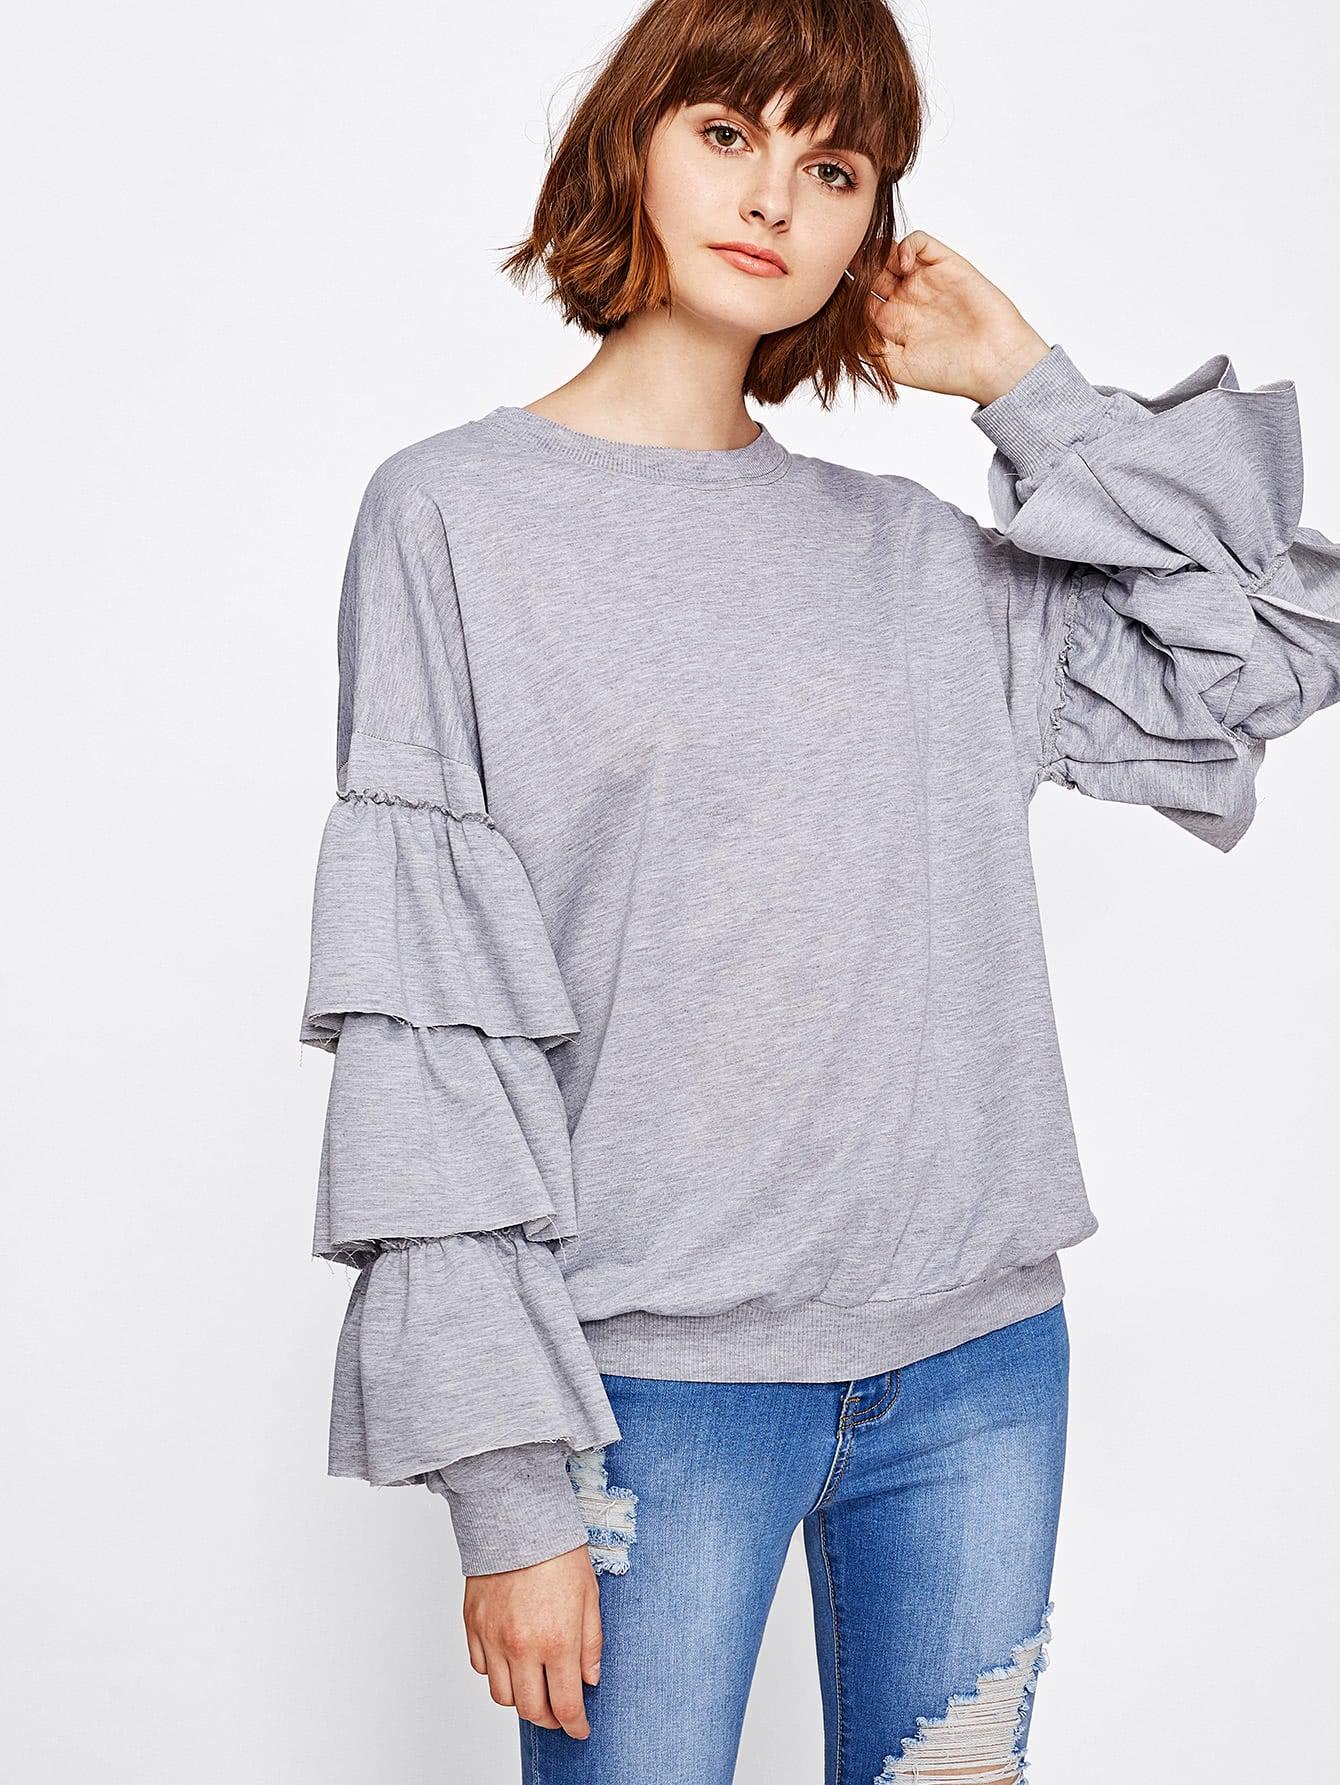 Tiered Frill Sleeve Marled Sweatshirt frill sleeve tape detail sweatshirt